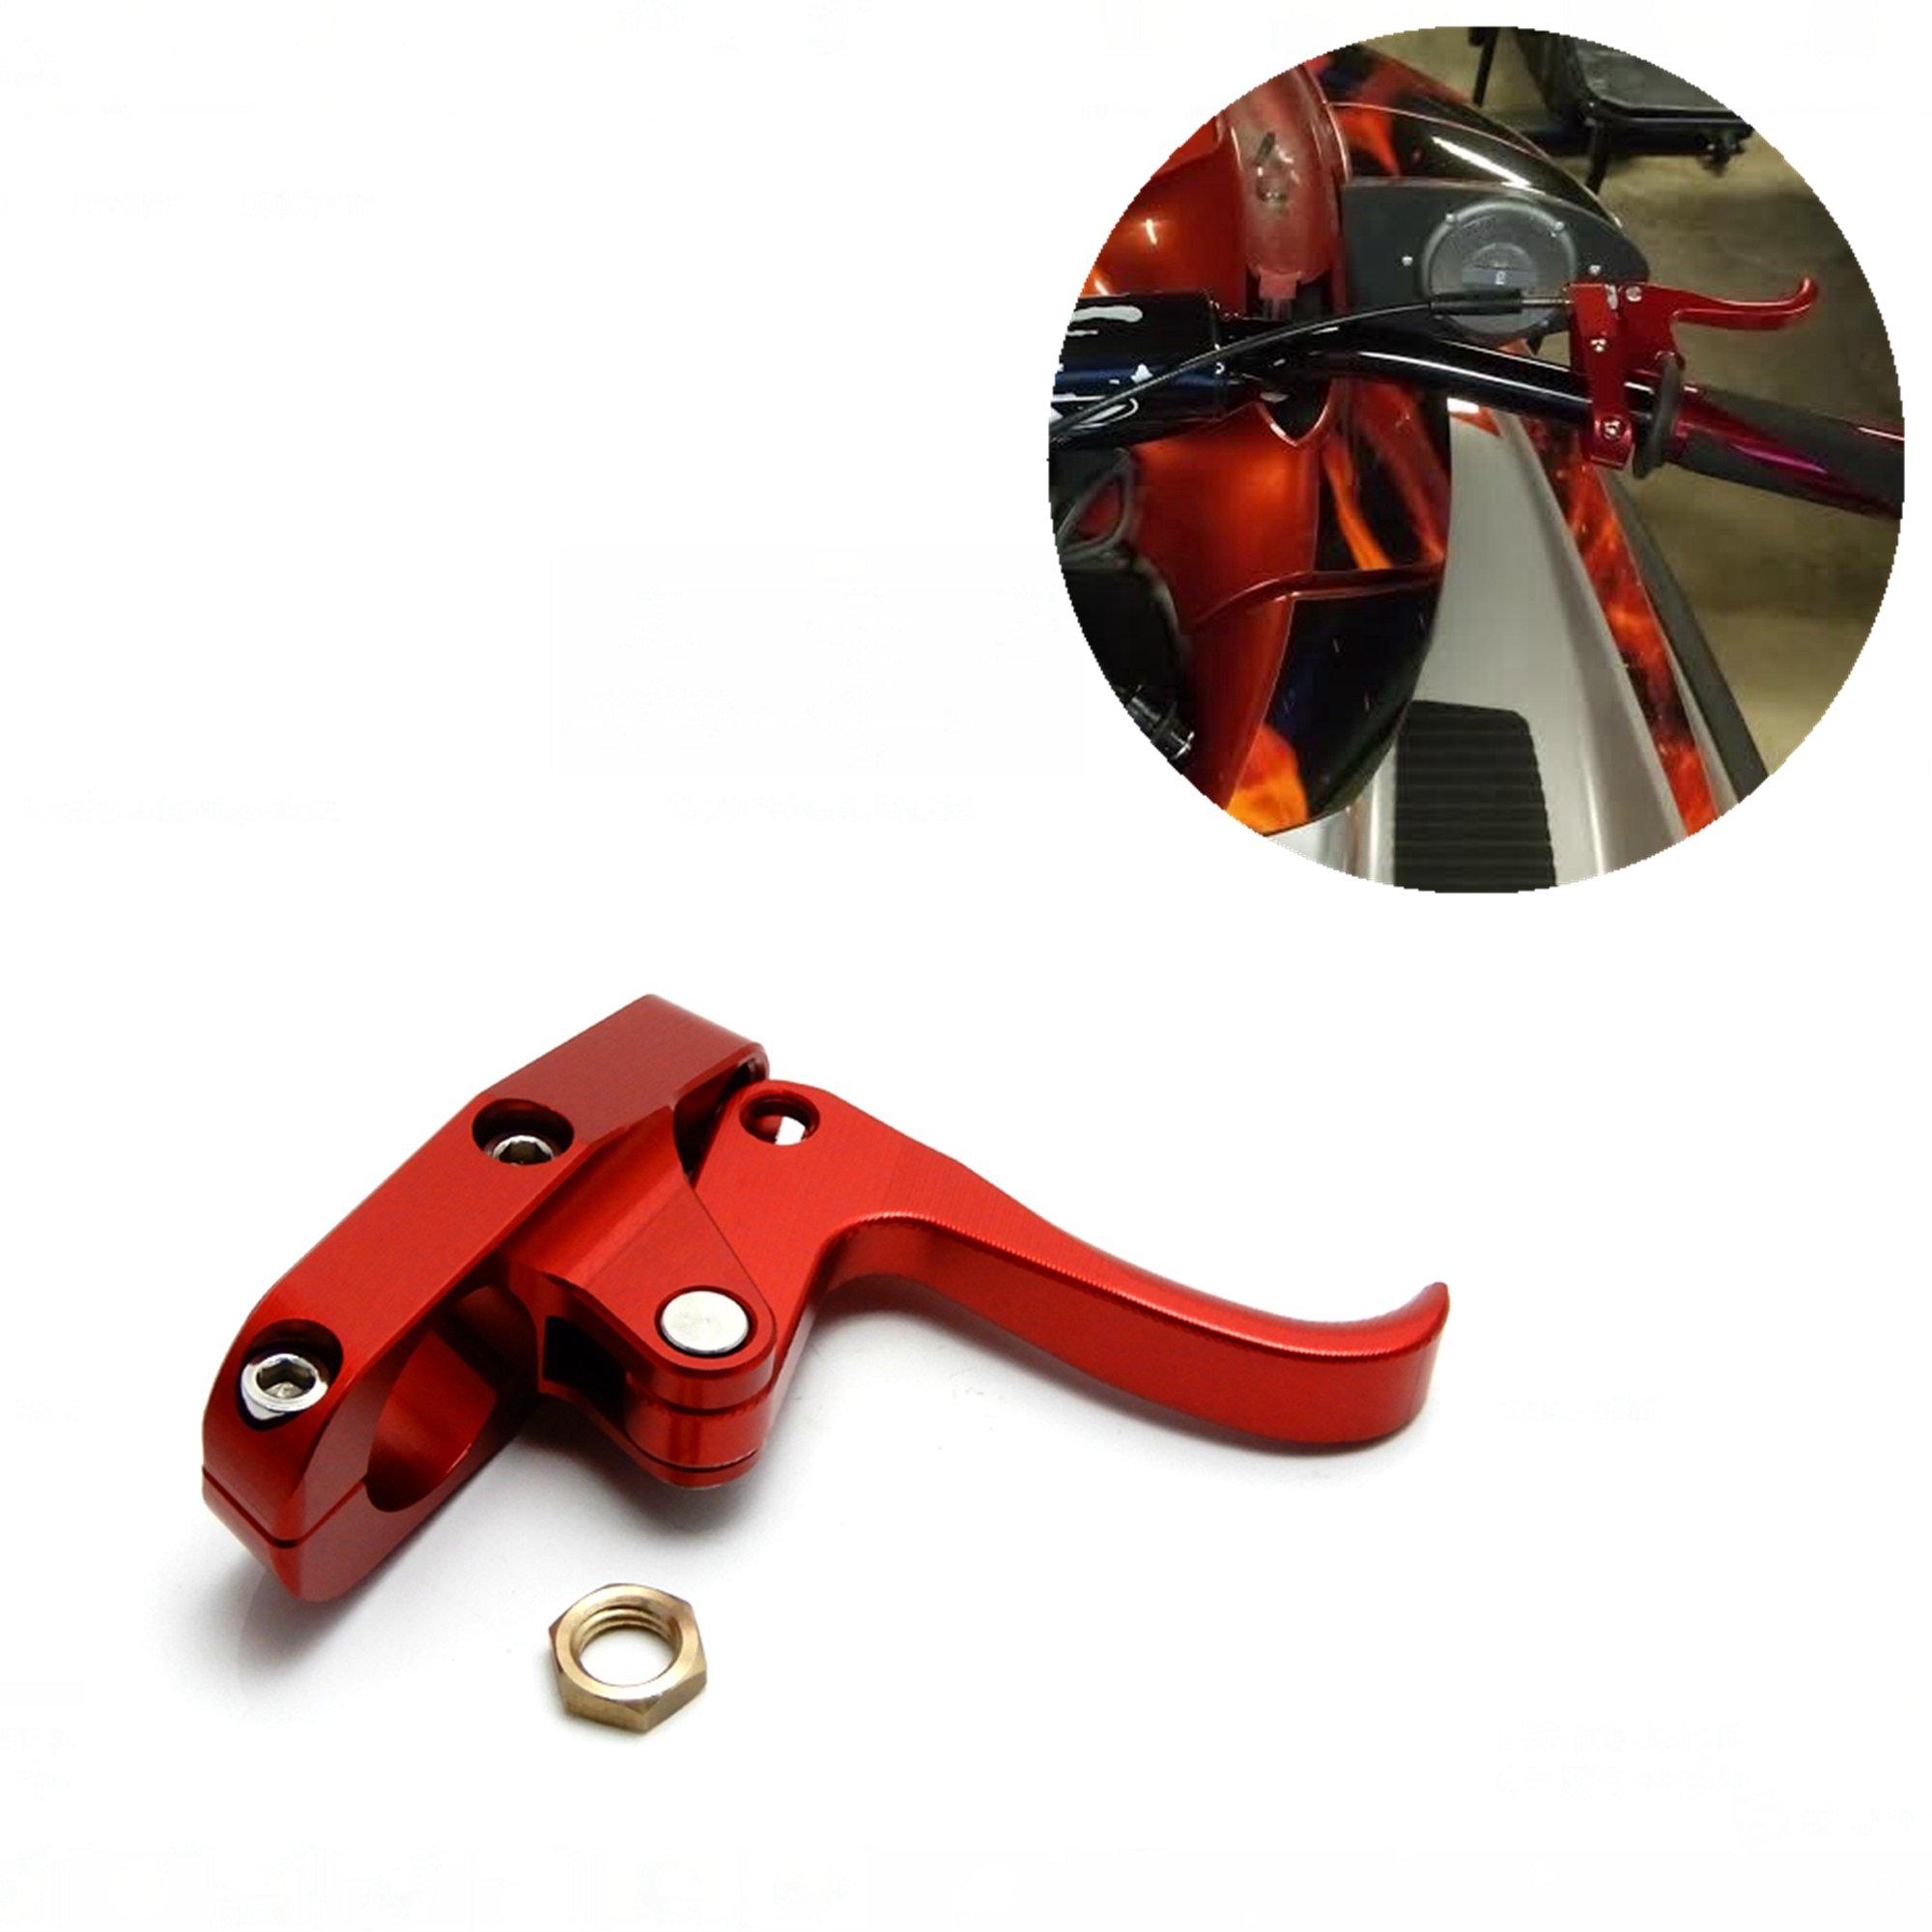 KEMIMOTO Aluminum Finger Throttle for Yamaha Wave Runner Kawasaki Super Jet Ski Sea-Doo (Red) …